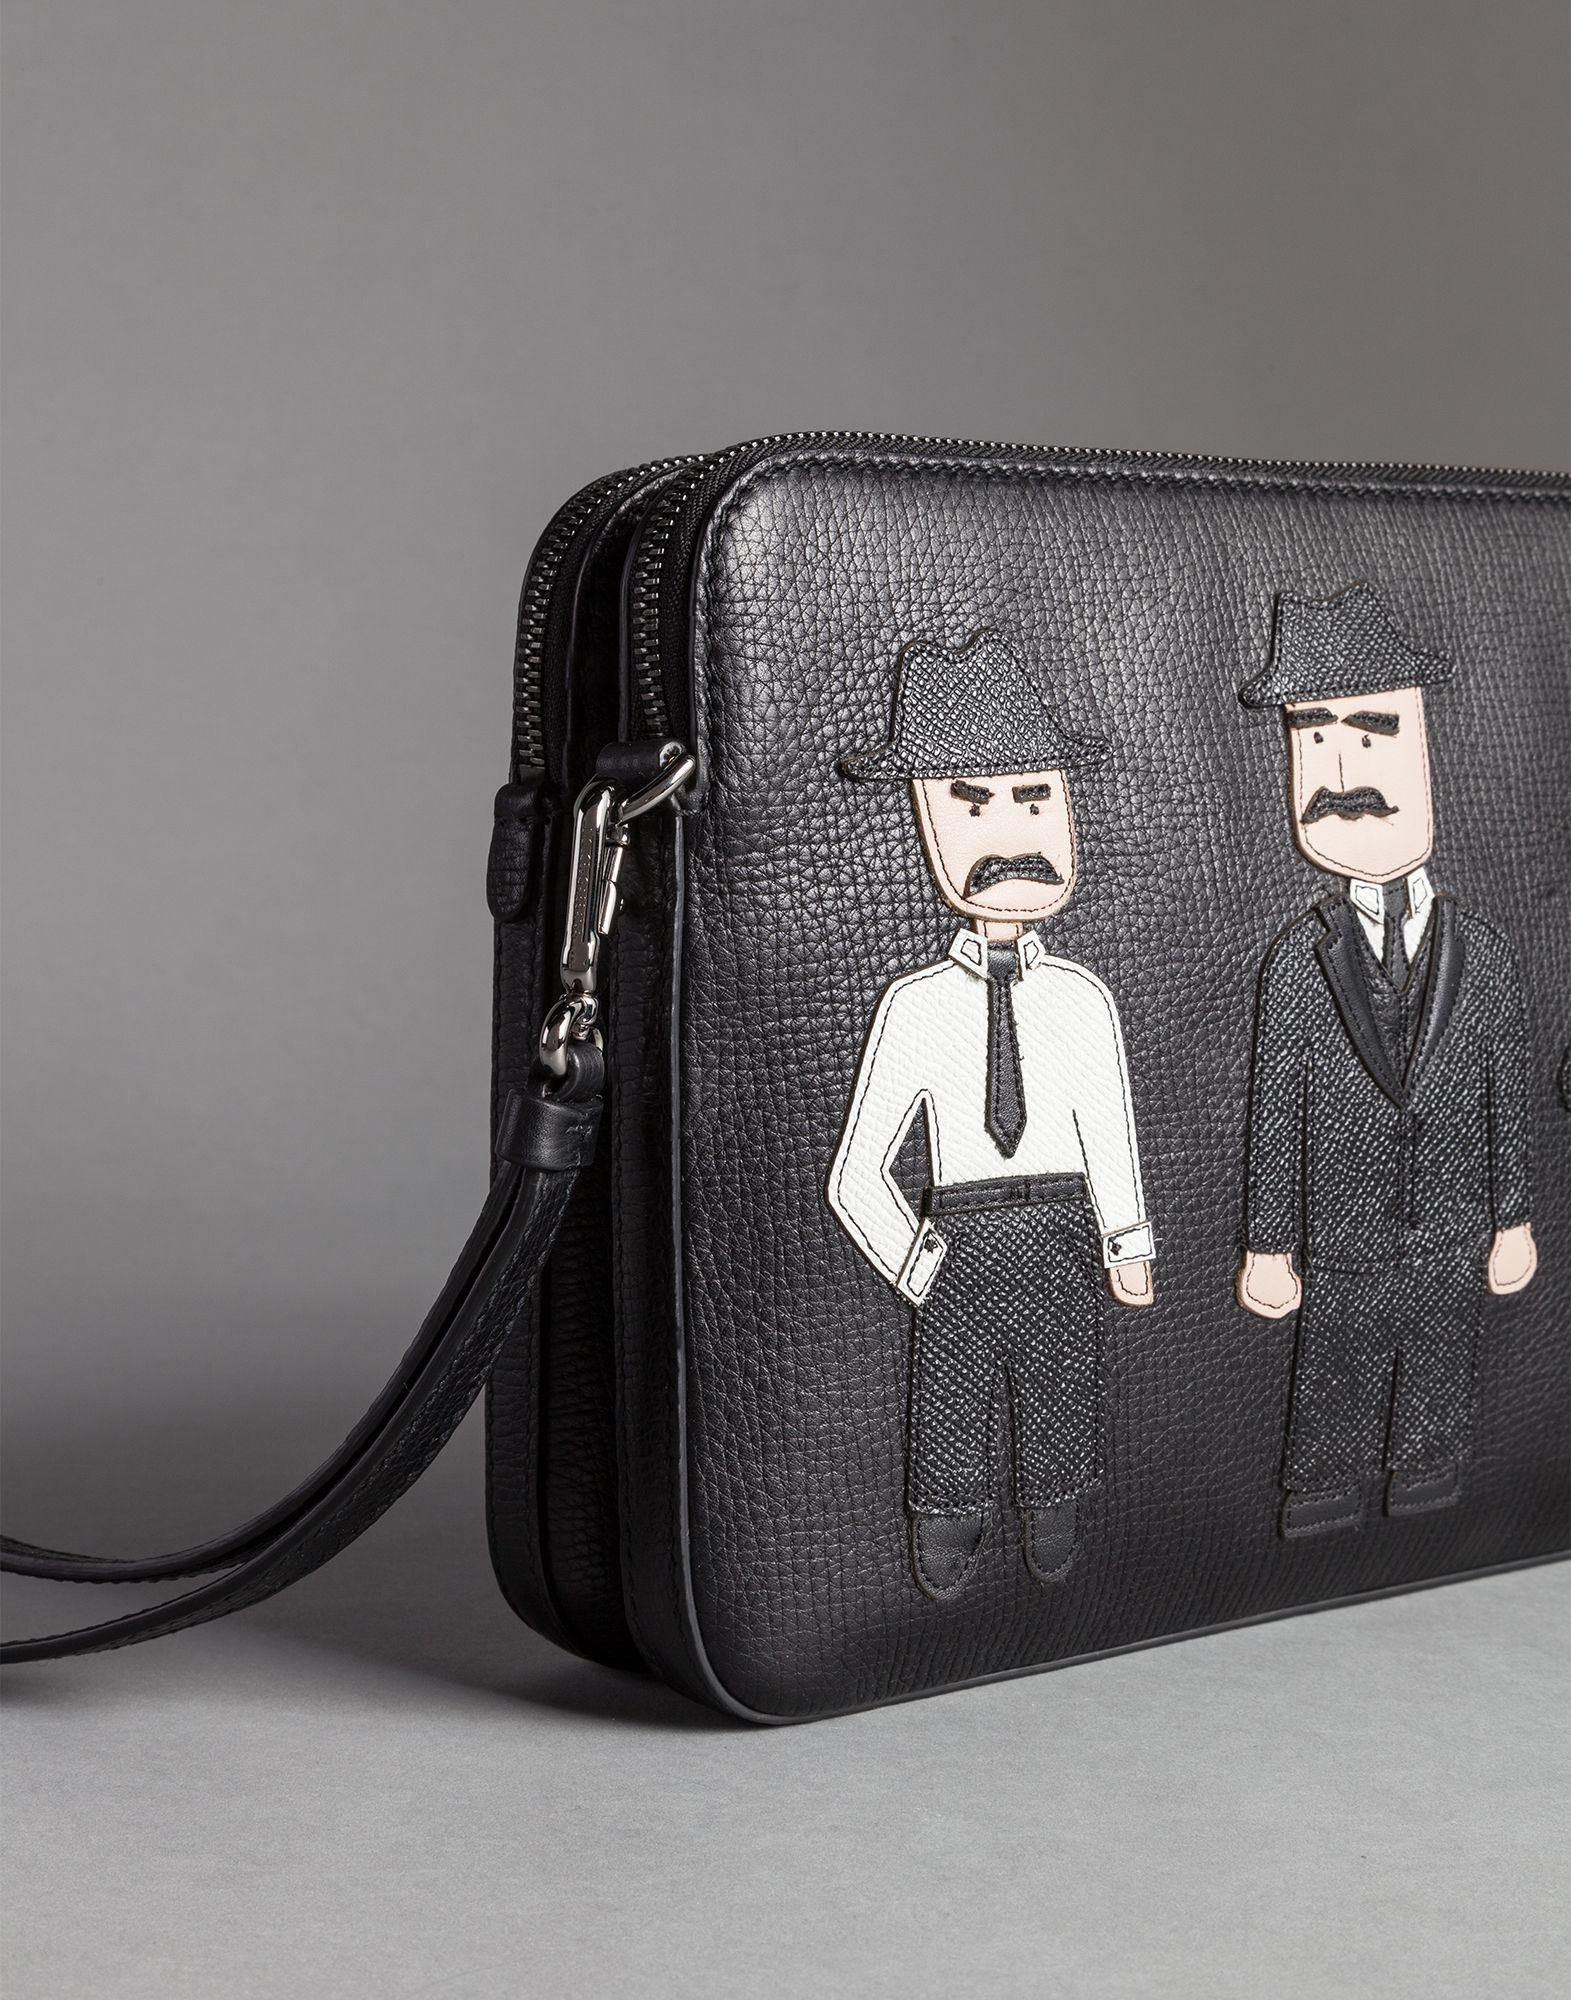 Lyst - Dolce   Gabbana Mediterraneo Calfskin Pouch Sicilian Men ... 7df35ea1886b8